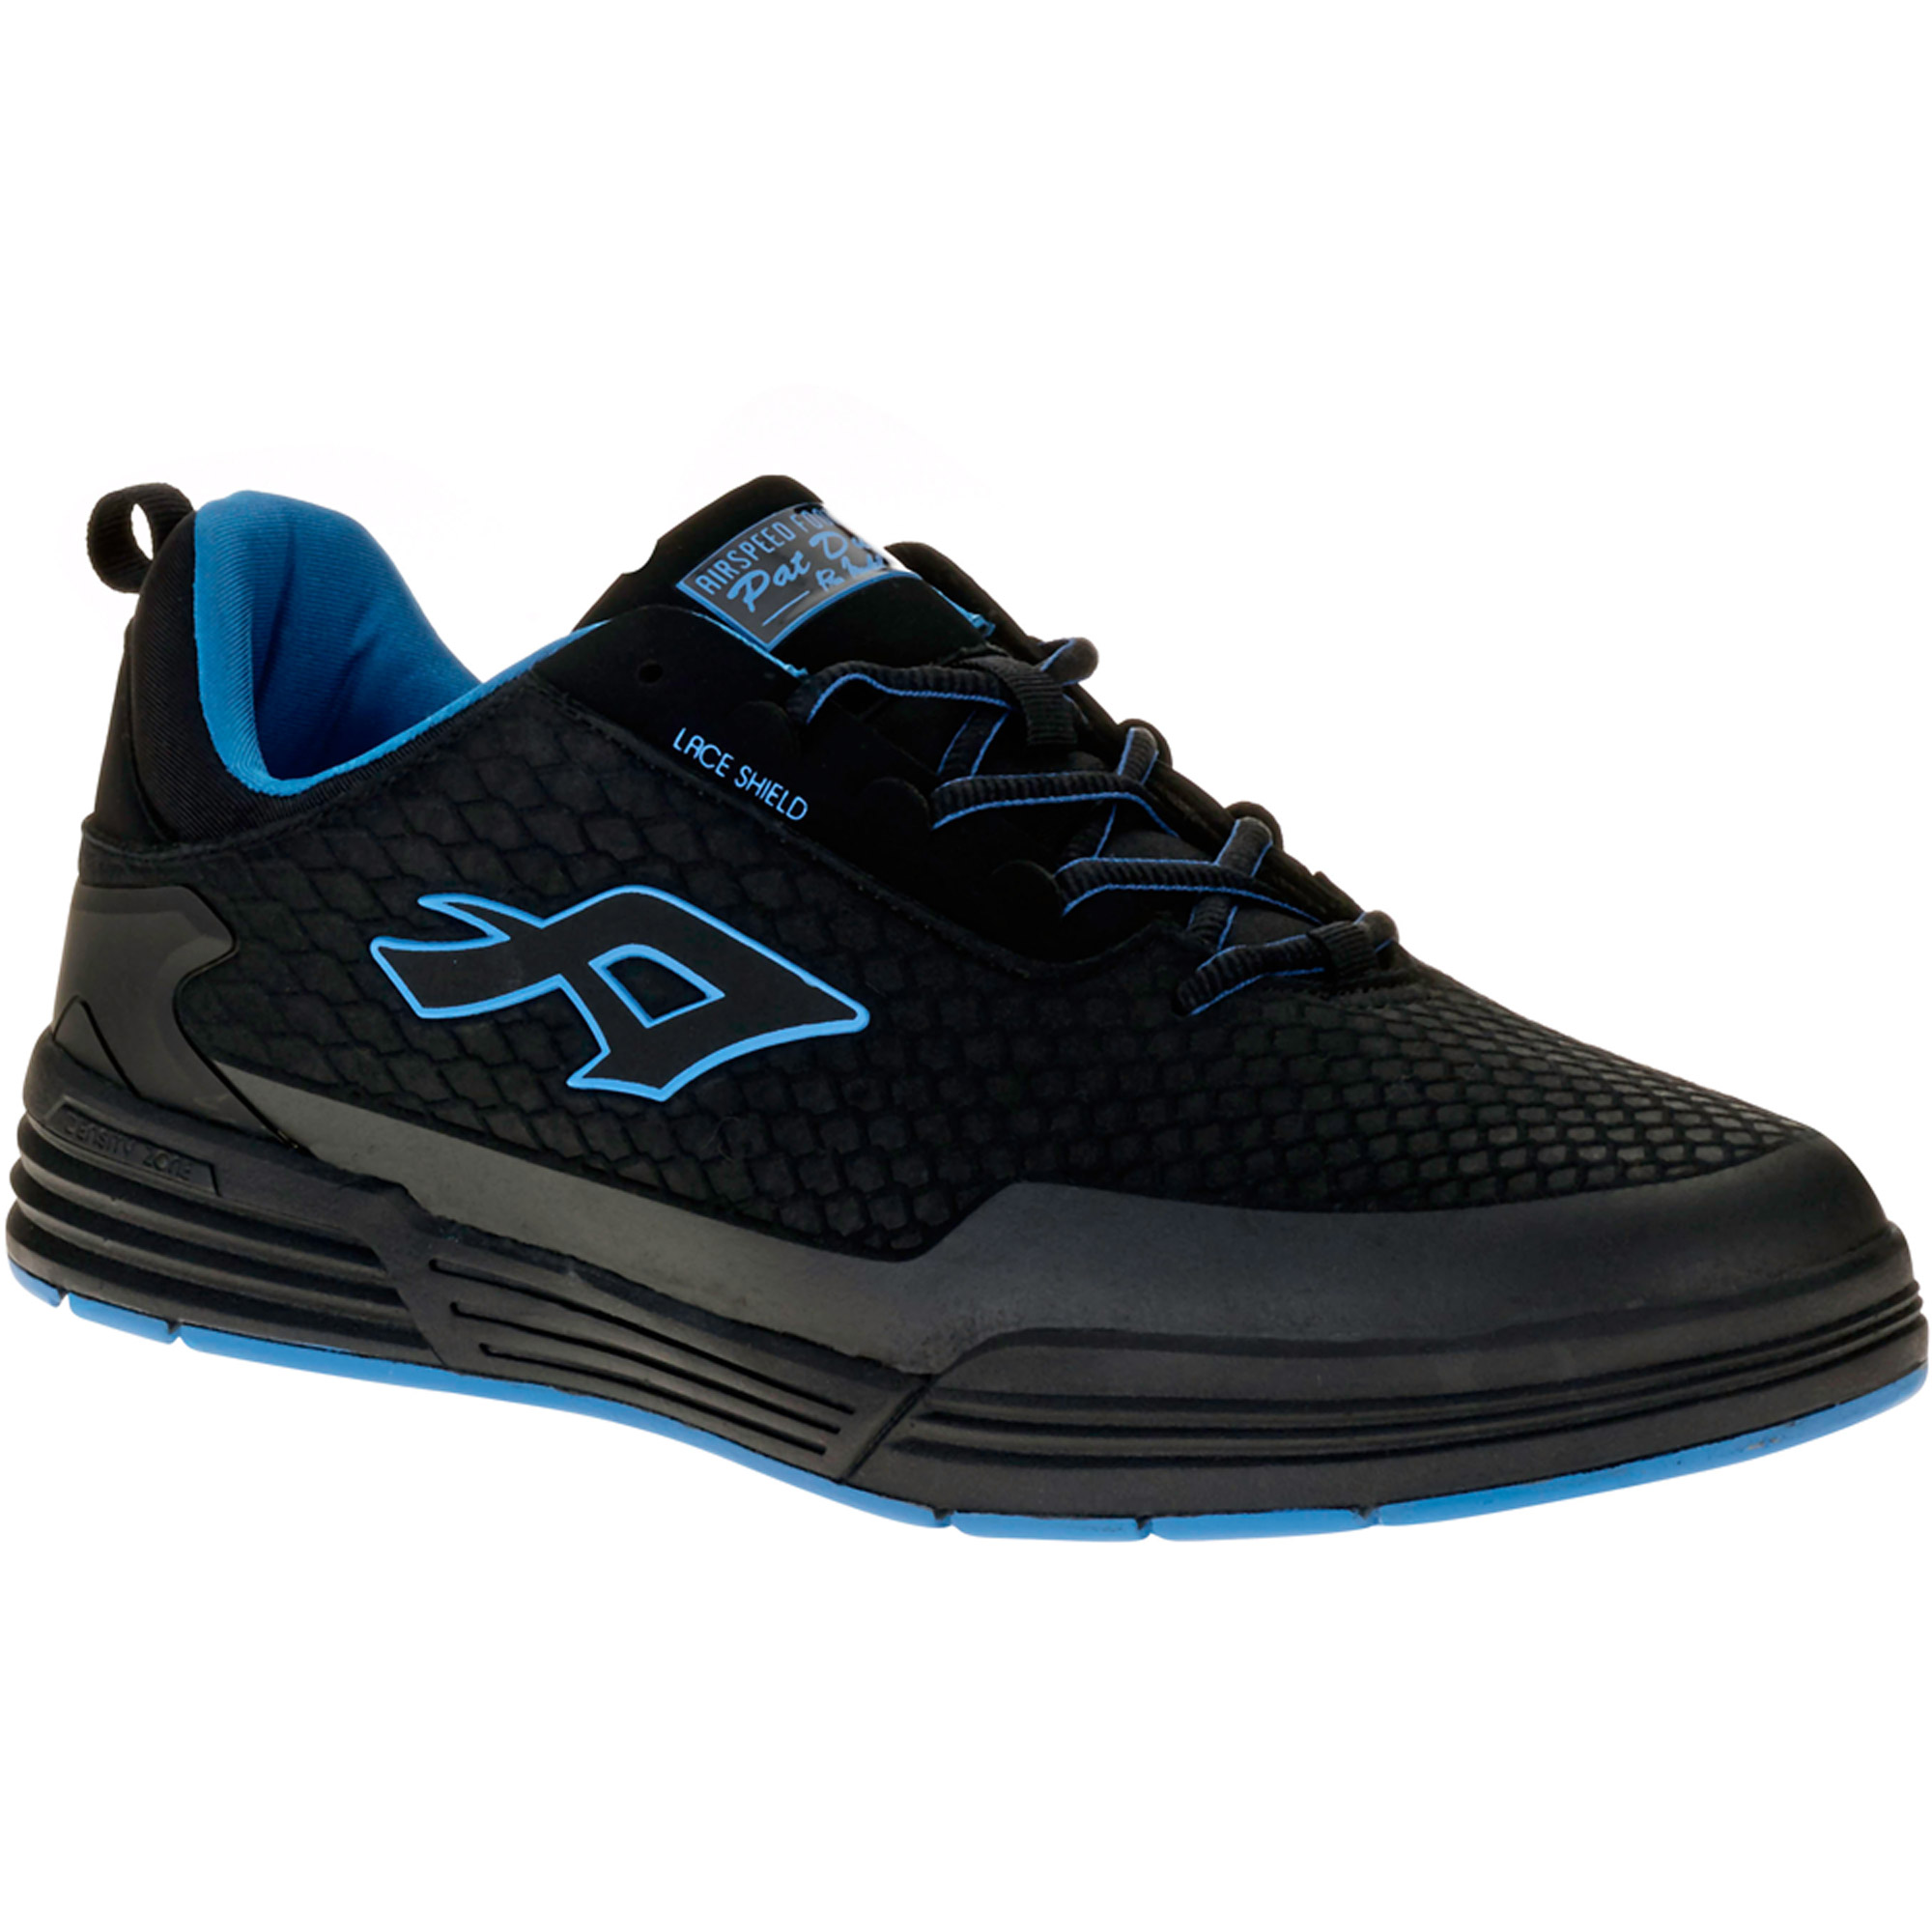 Skate shoes walmart - Skate Shoes Walmart 5